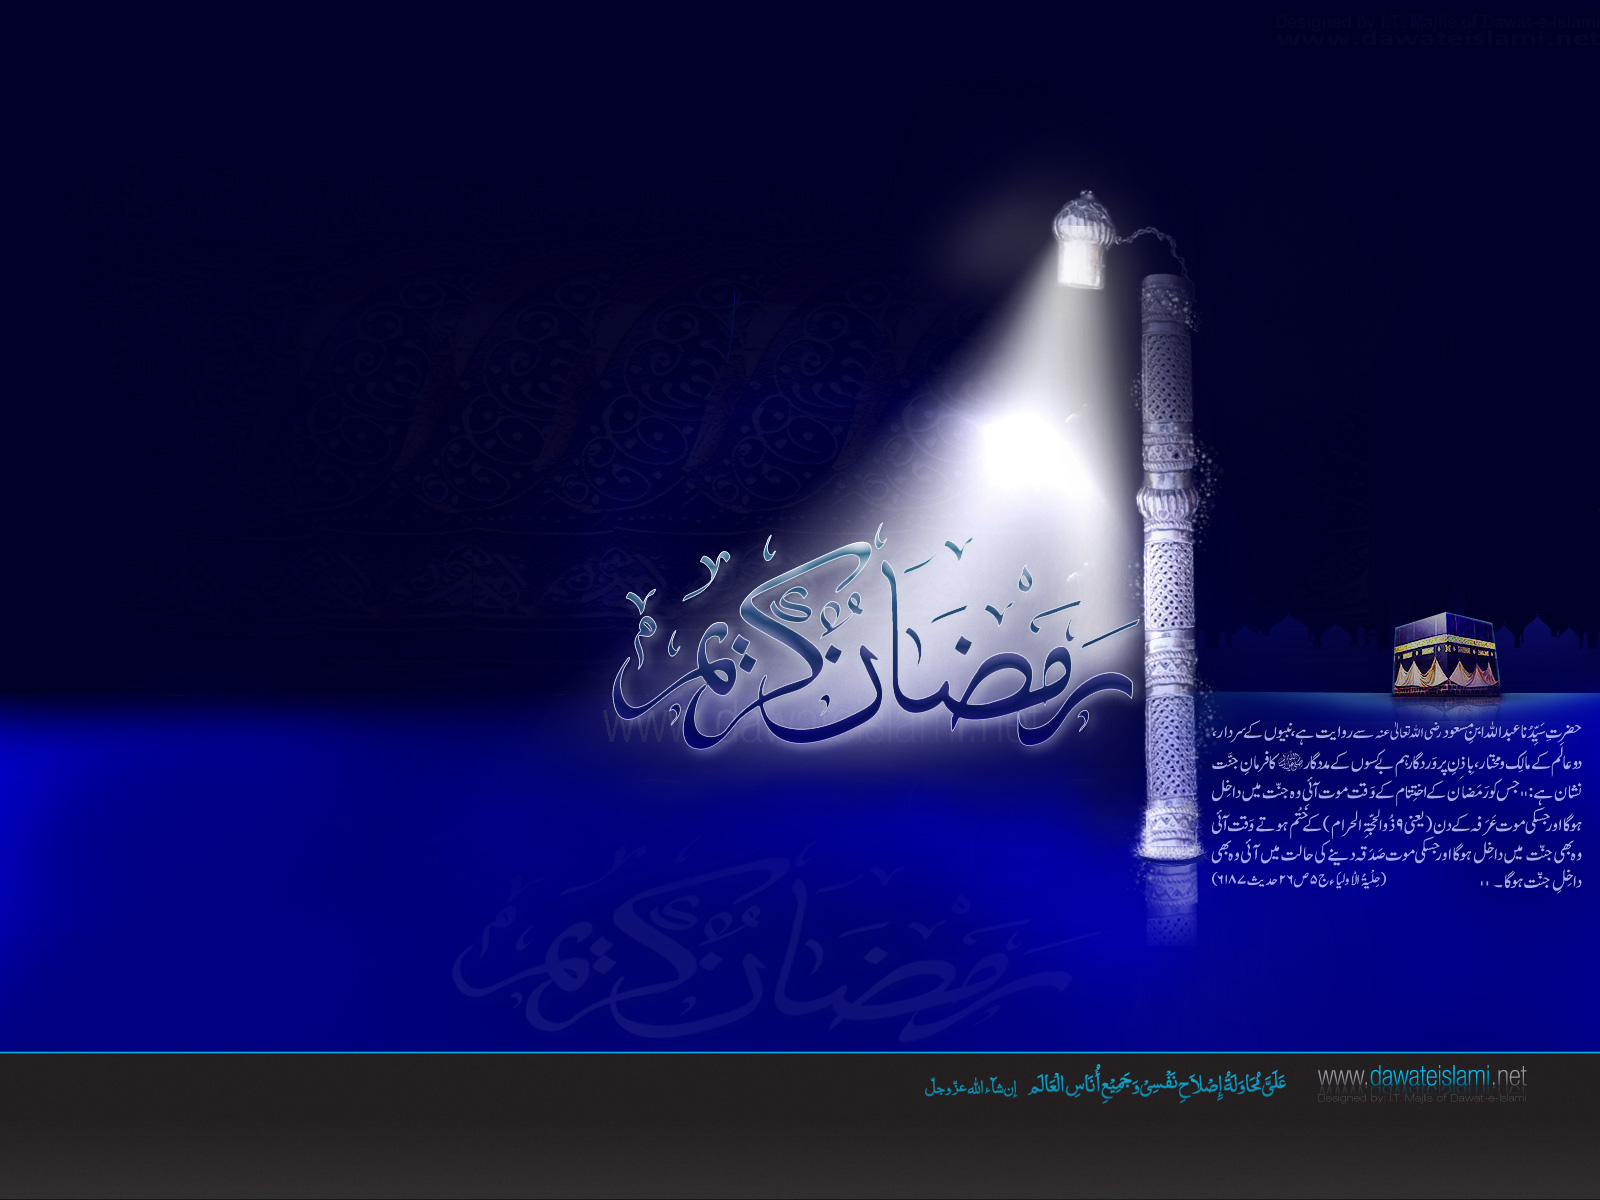 http://4.bp.blogspot.com/-bXO0gmbLtS8/T_ykZaCirhI/AAAAAAAAATI/Vh02hPFkFOQ/s1600/ramadan+kareem_wallpapers_by_dawateislami_1.jpg